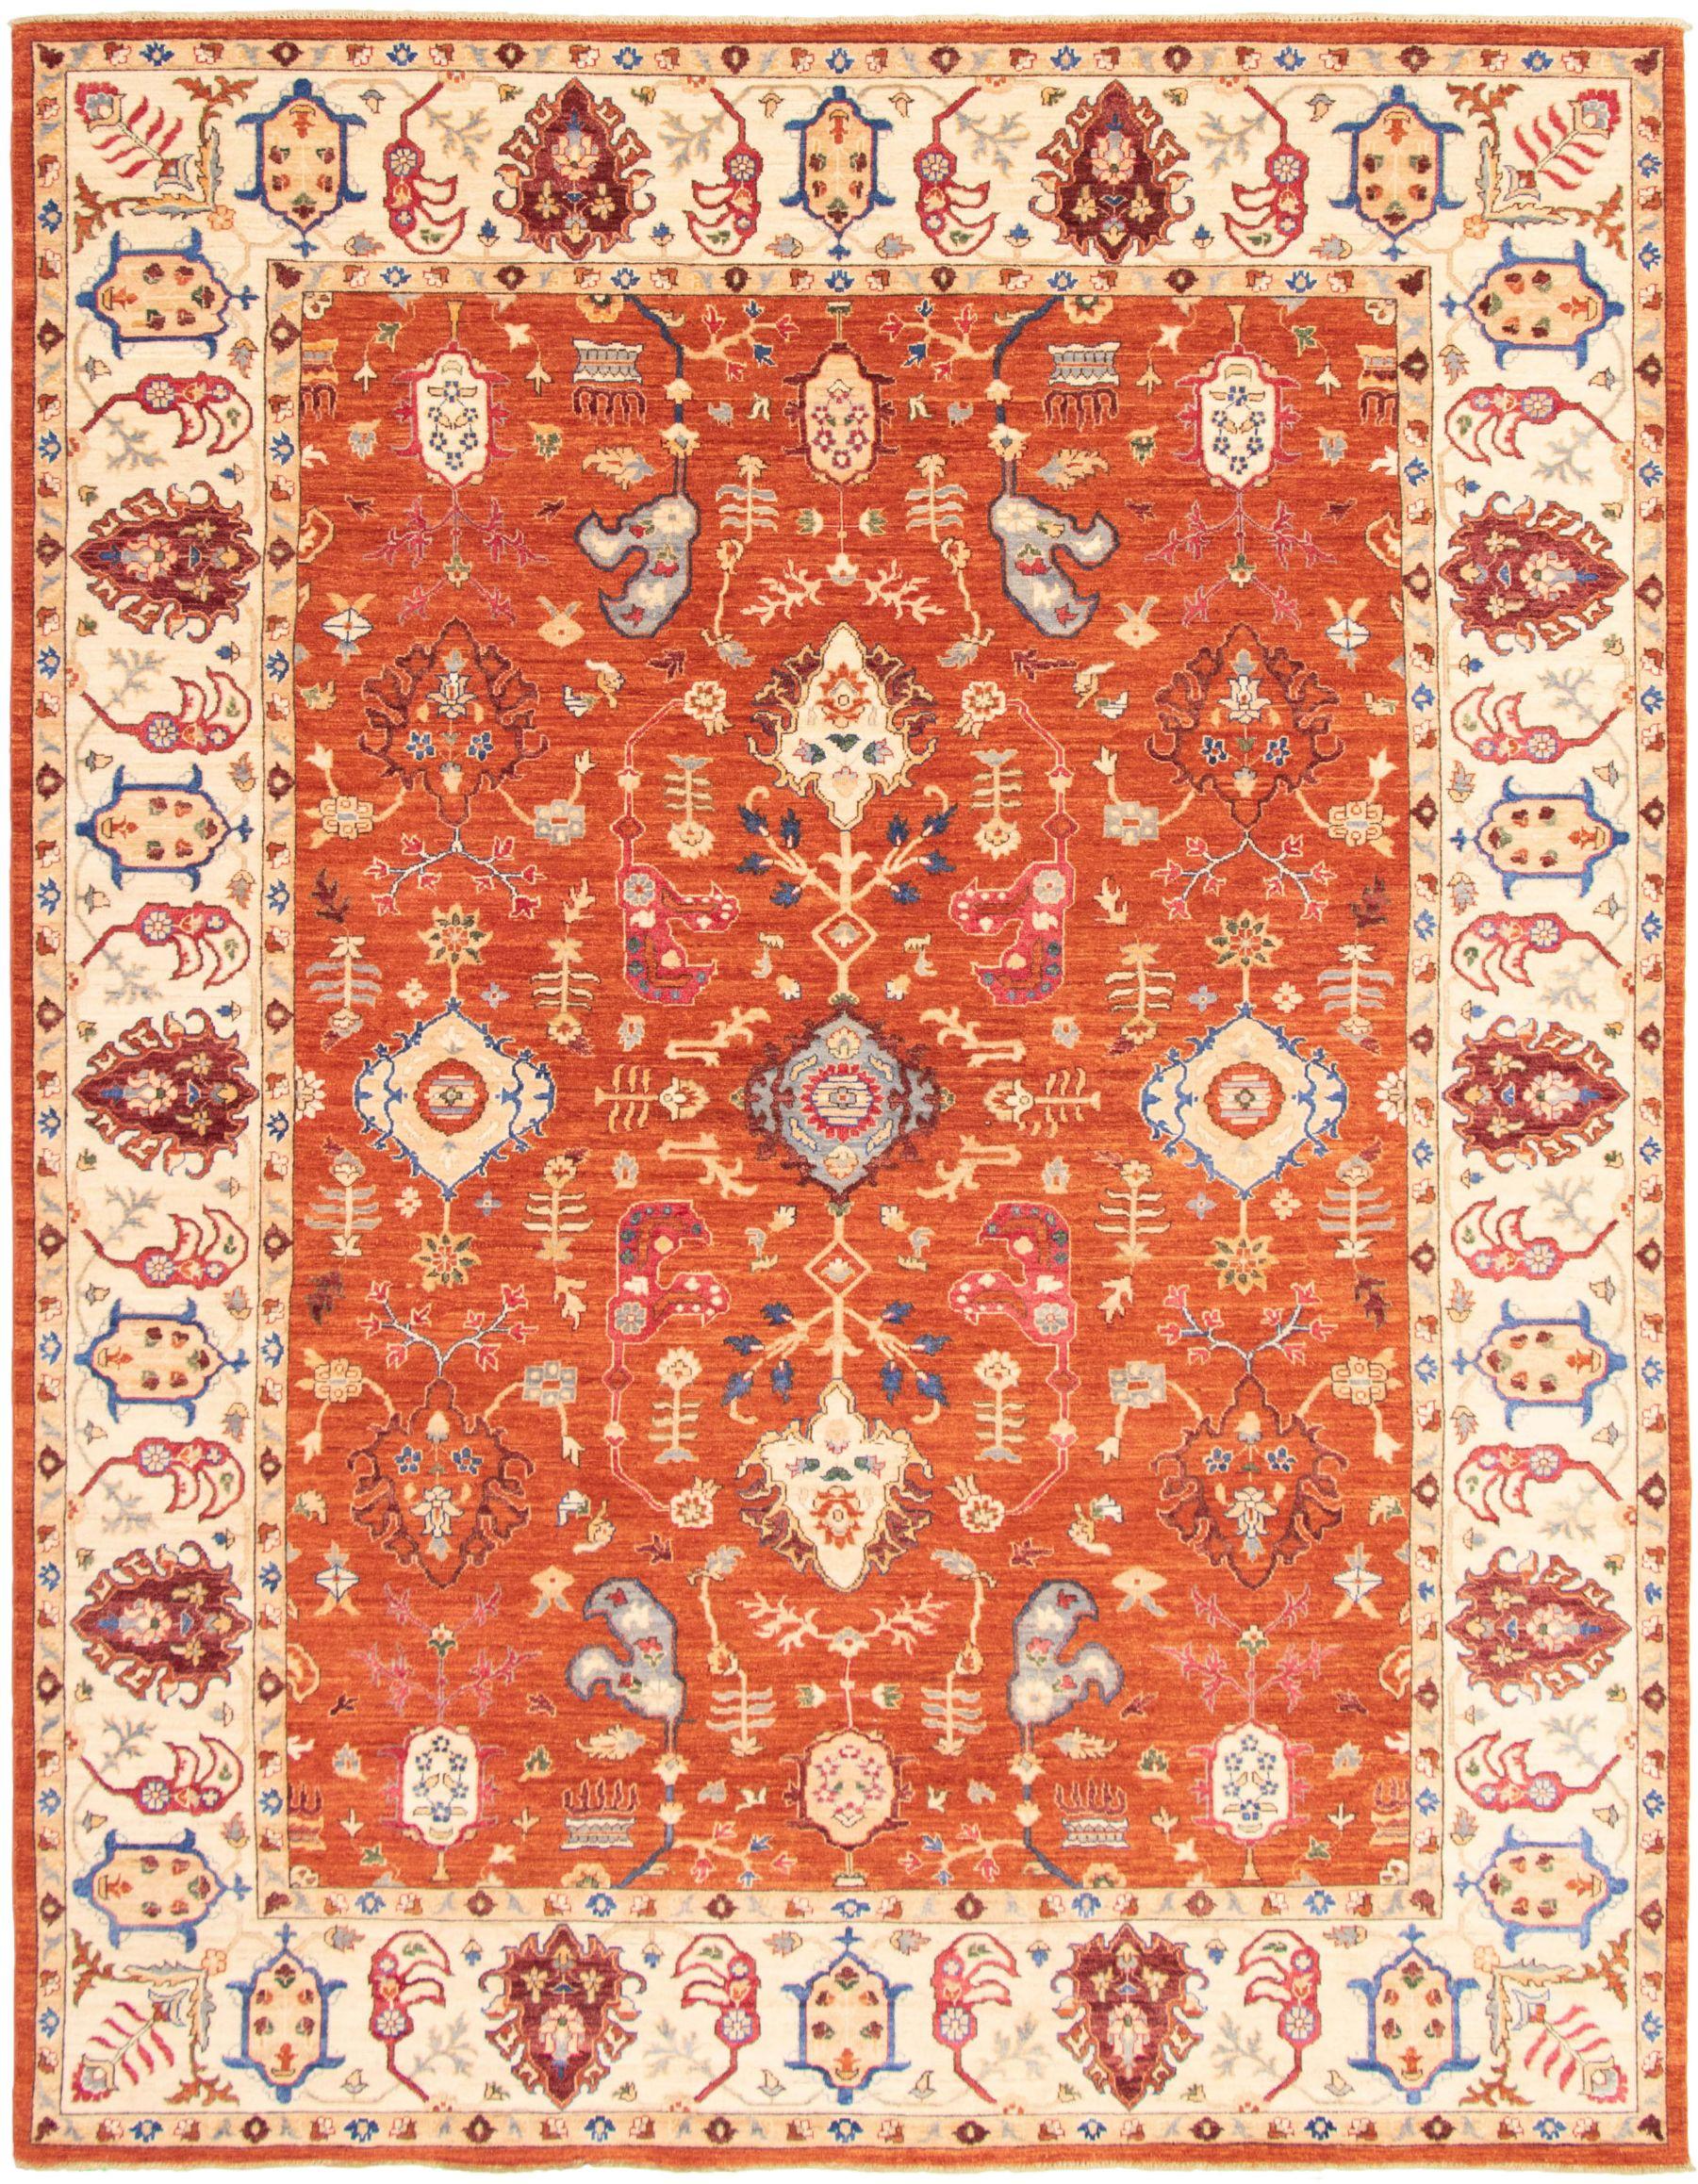 "Hand-knotted Pako Persian 18/20 Burnt Orange WooL/Silk Rug 9'1"" x 11'8"" Size: 9'1"" x 11'8"""